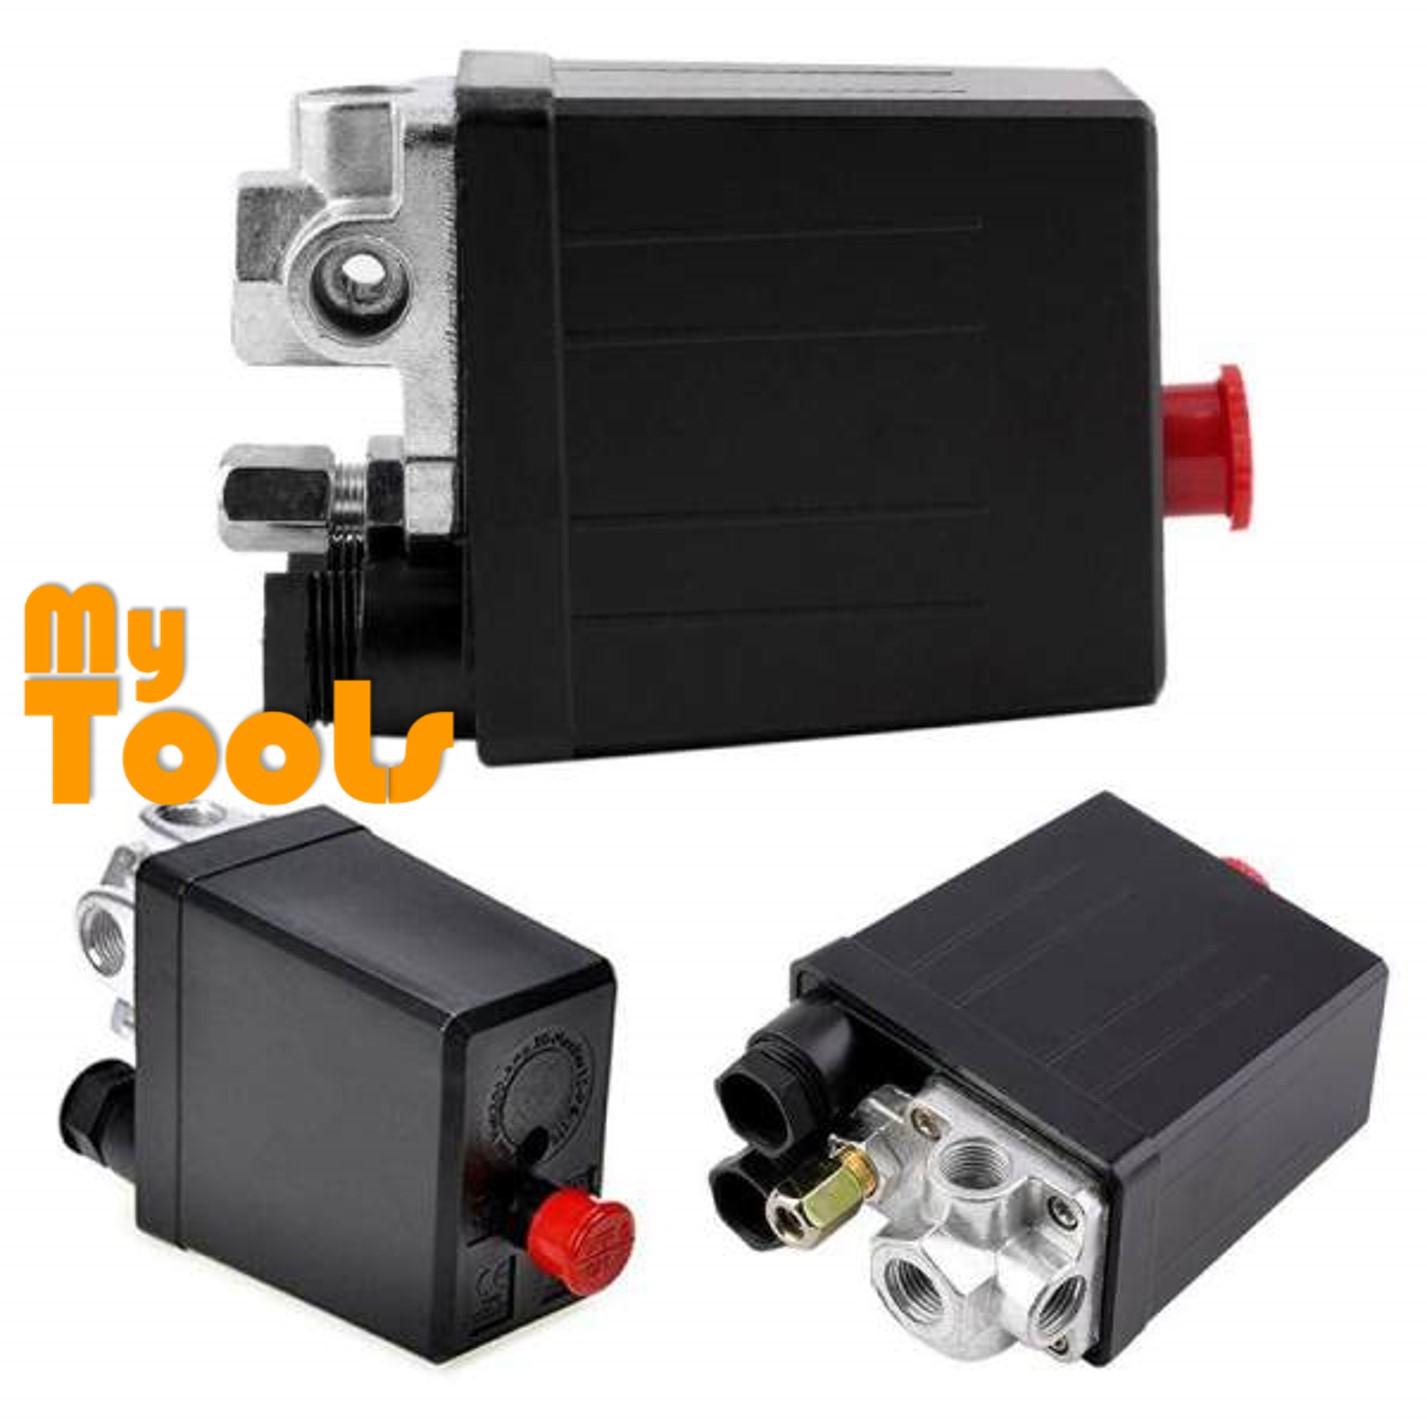 Regulator Gauges Control Switch Valve Air Compressor Pressure 90-120 PSI Valve 4 Way